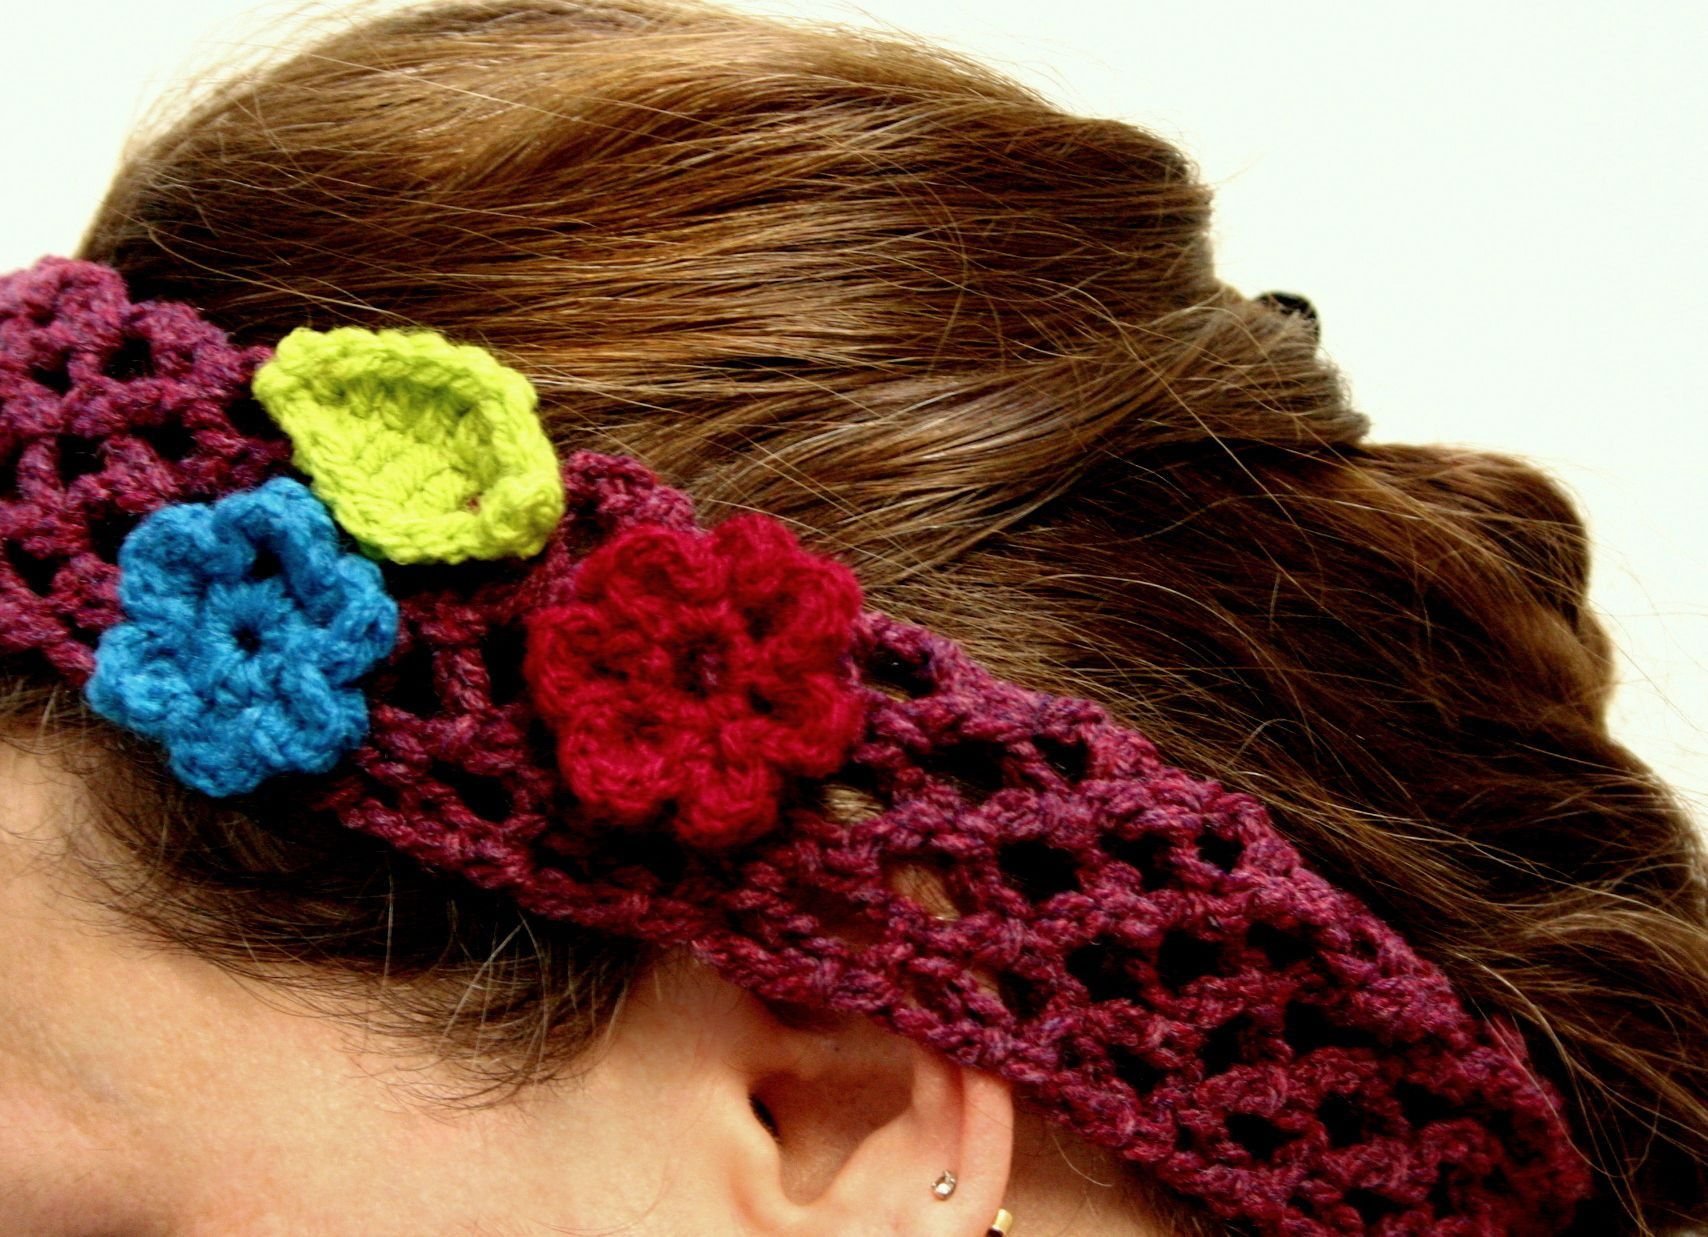 hair bohemian hippie cotton vintage boho crochet accessory headband